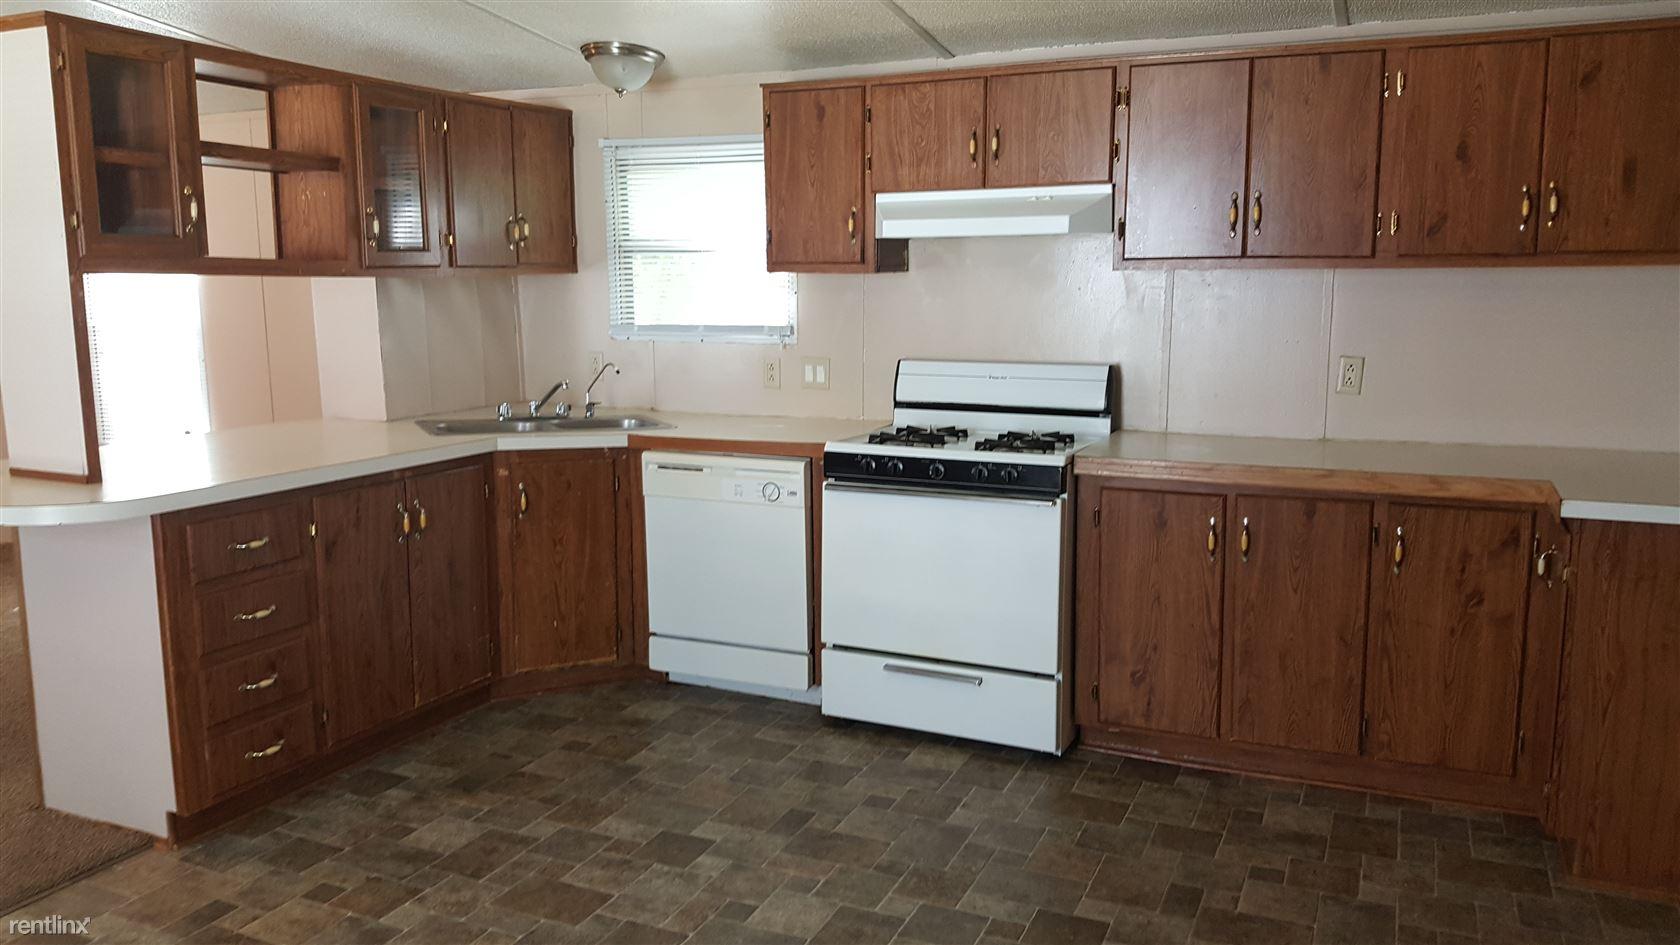 2201 E Macarthur Rd # 22, Wichita, KS 67216